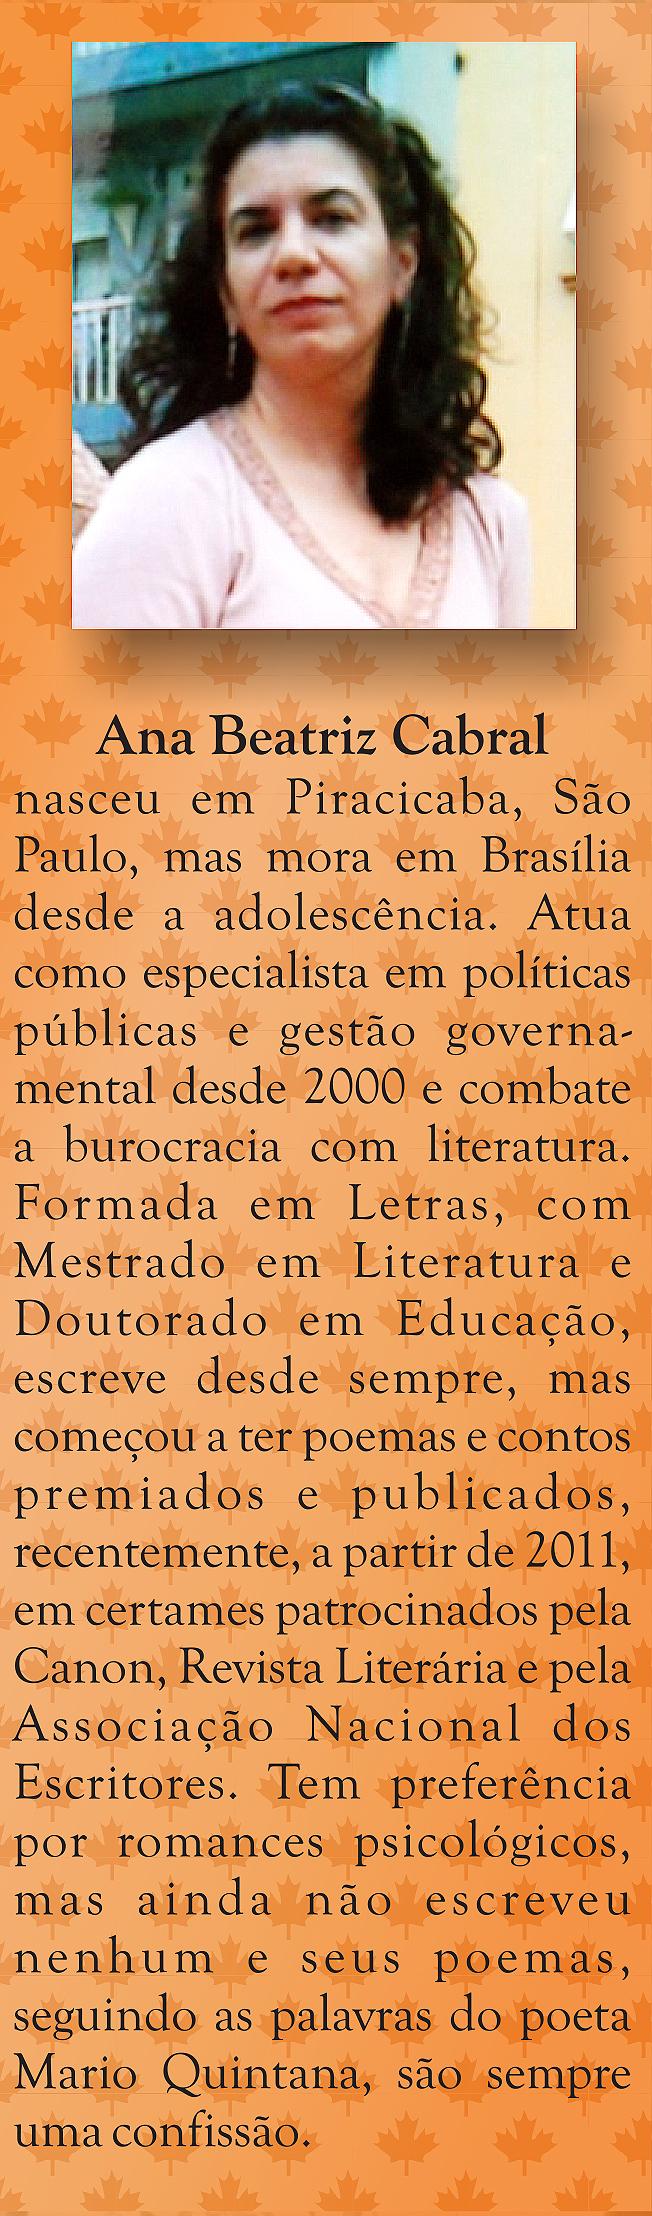 Ana Beatriz Cabral - Tocata e Fuga (2).jpg